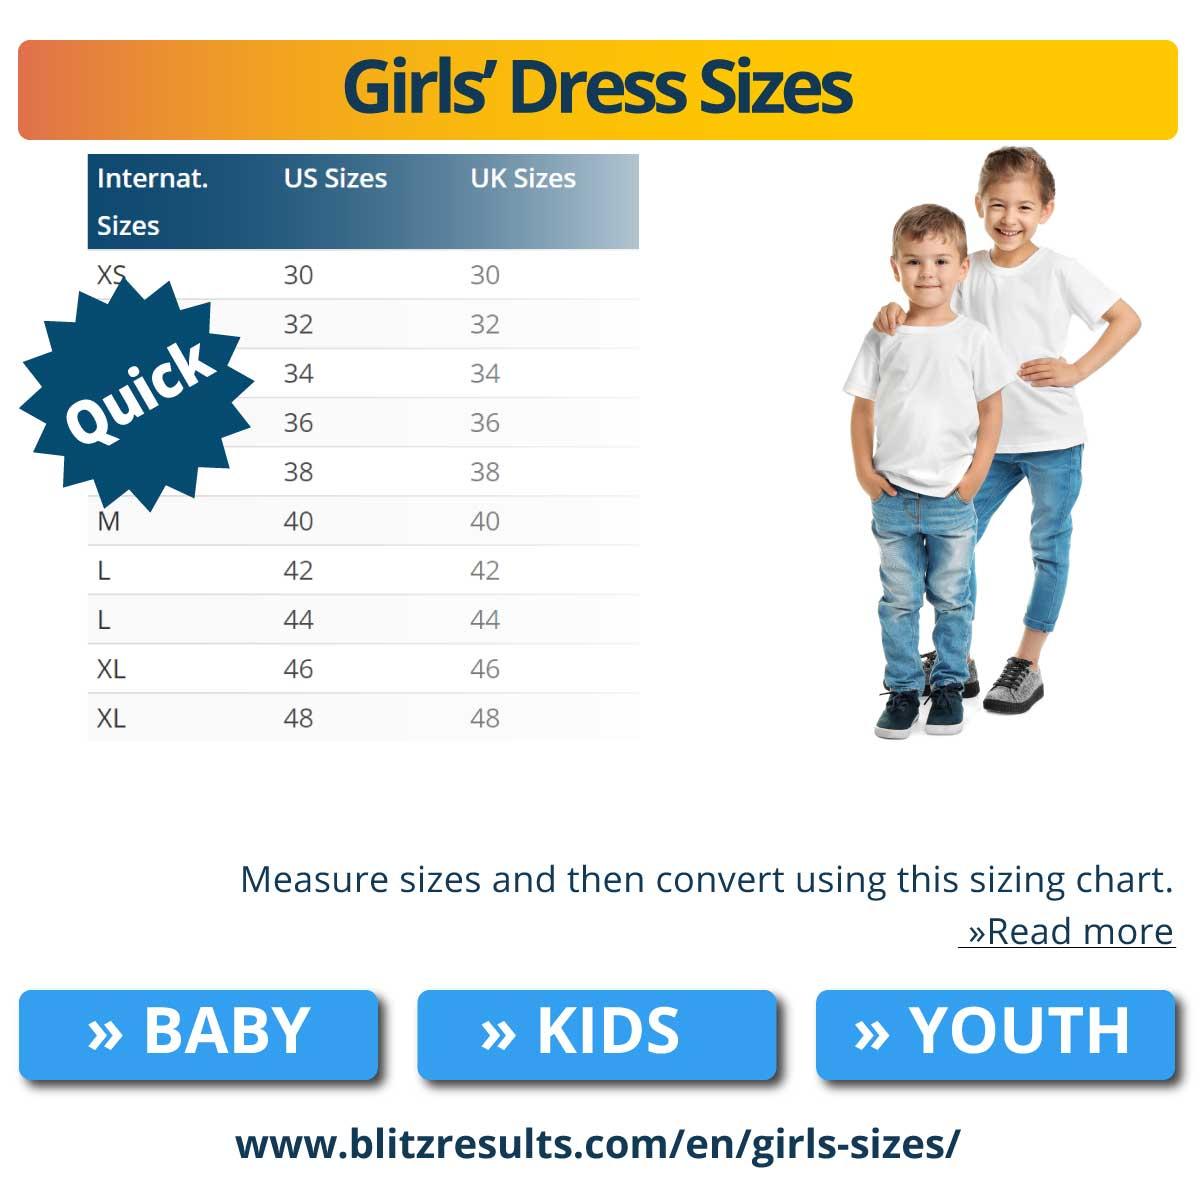 Girls' Dress Sizes